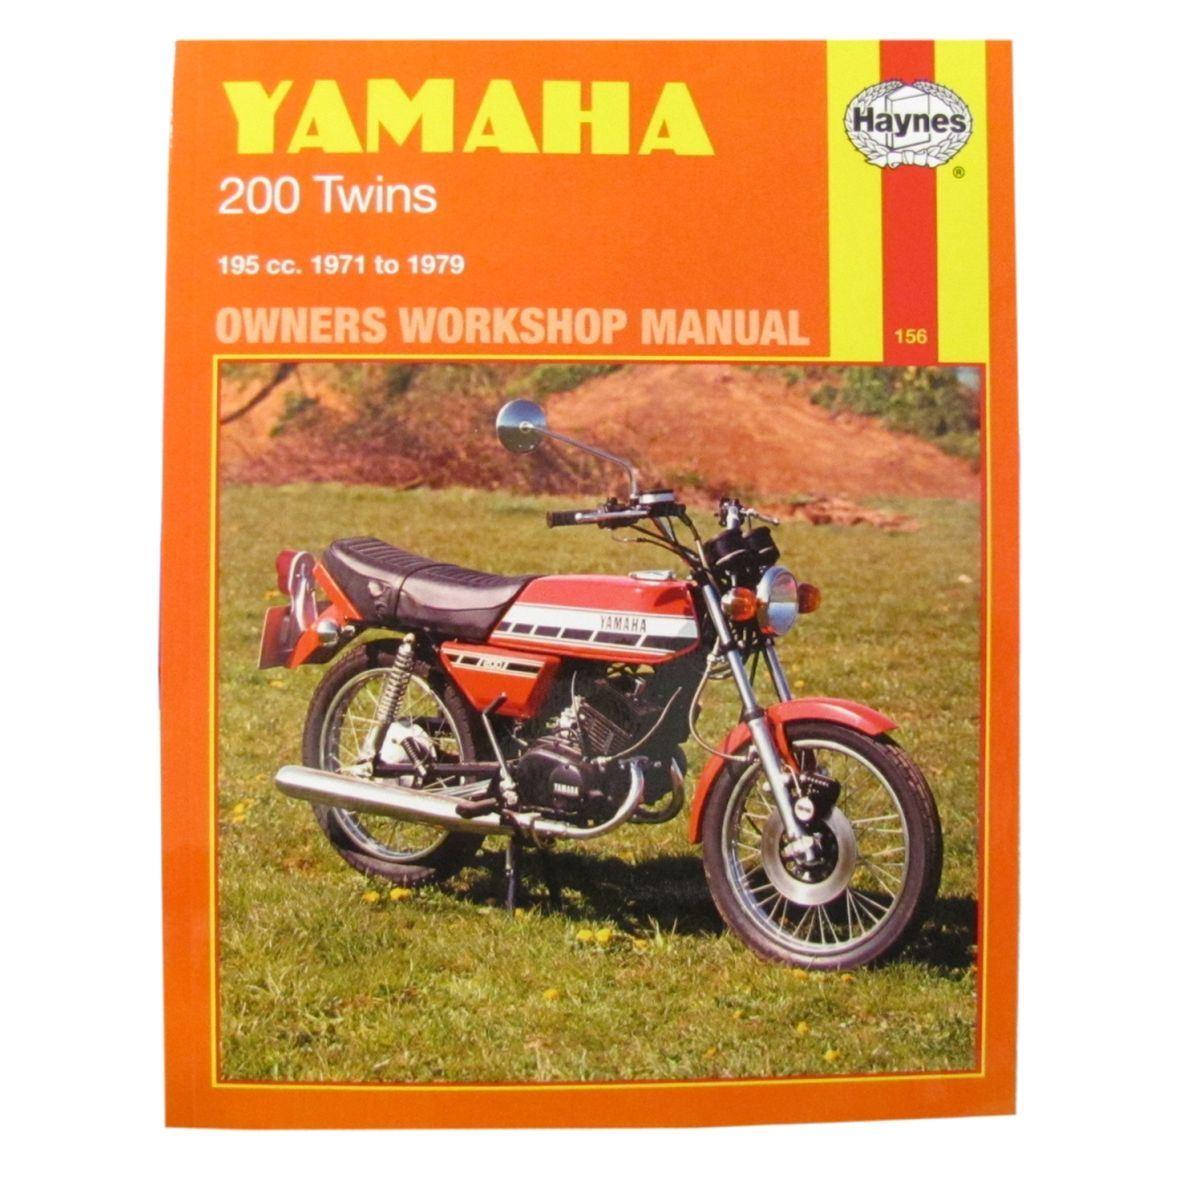 Details about Manual Haynes for 1974 Yamaha RD 200 DX (Spoke Wheel)